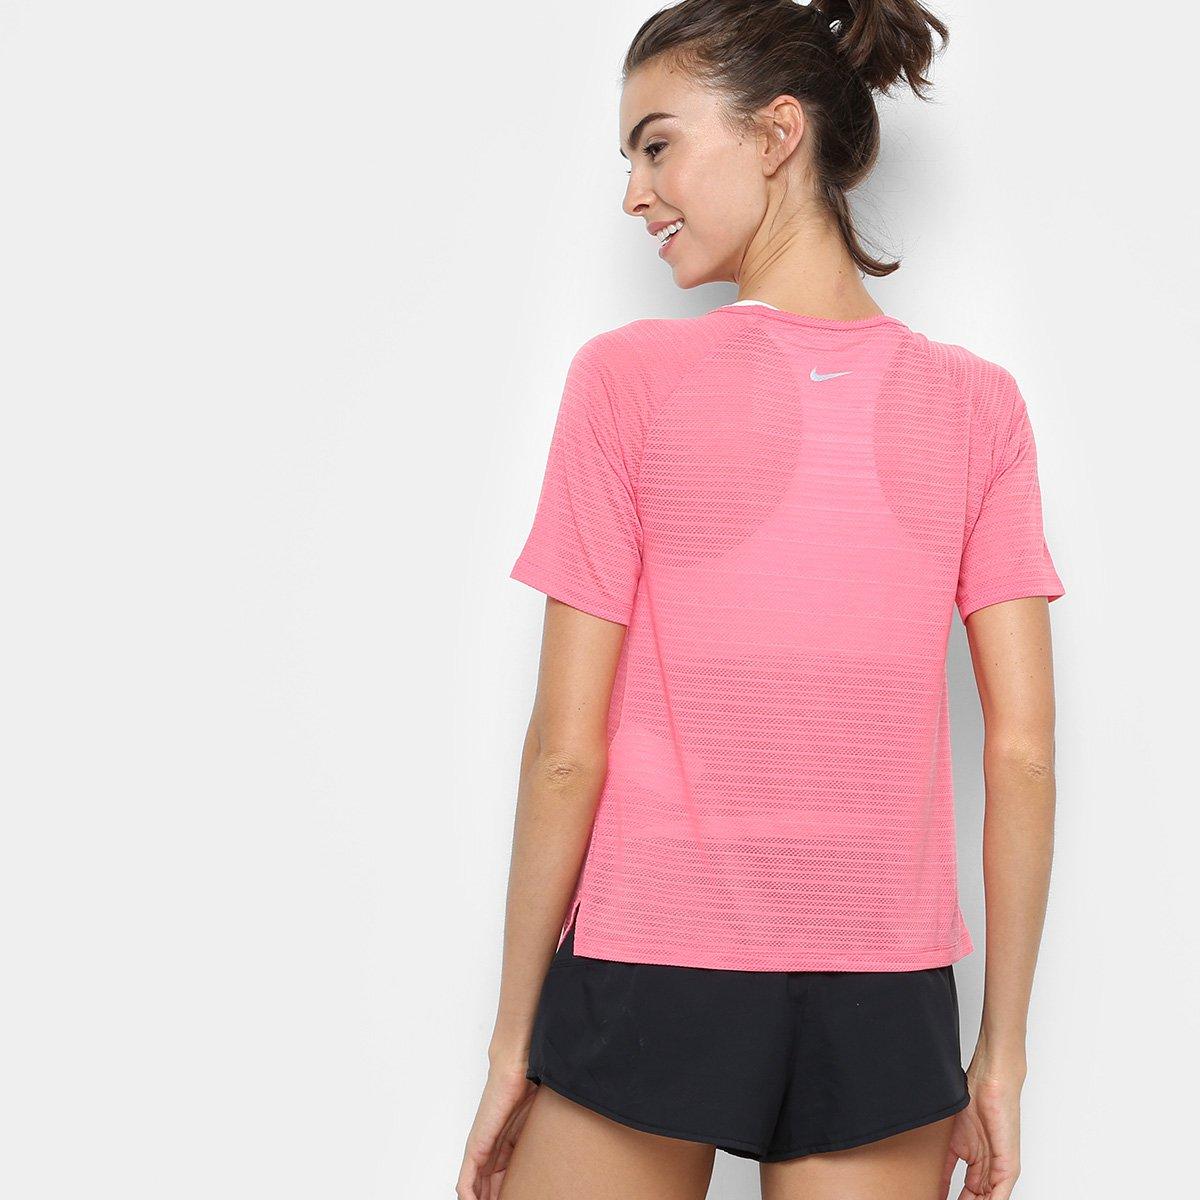 Camiseta Breathe Feminina Camiseta Nike Breathe Feminina Miler SS Miler Rosa Nike Rosa SS wqfxXTRfA